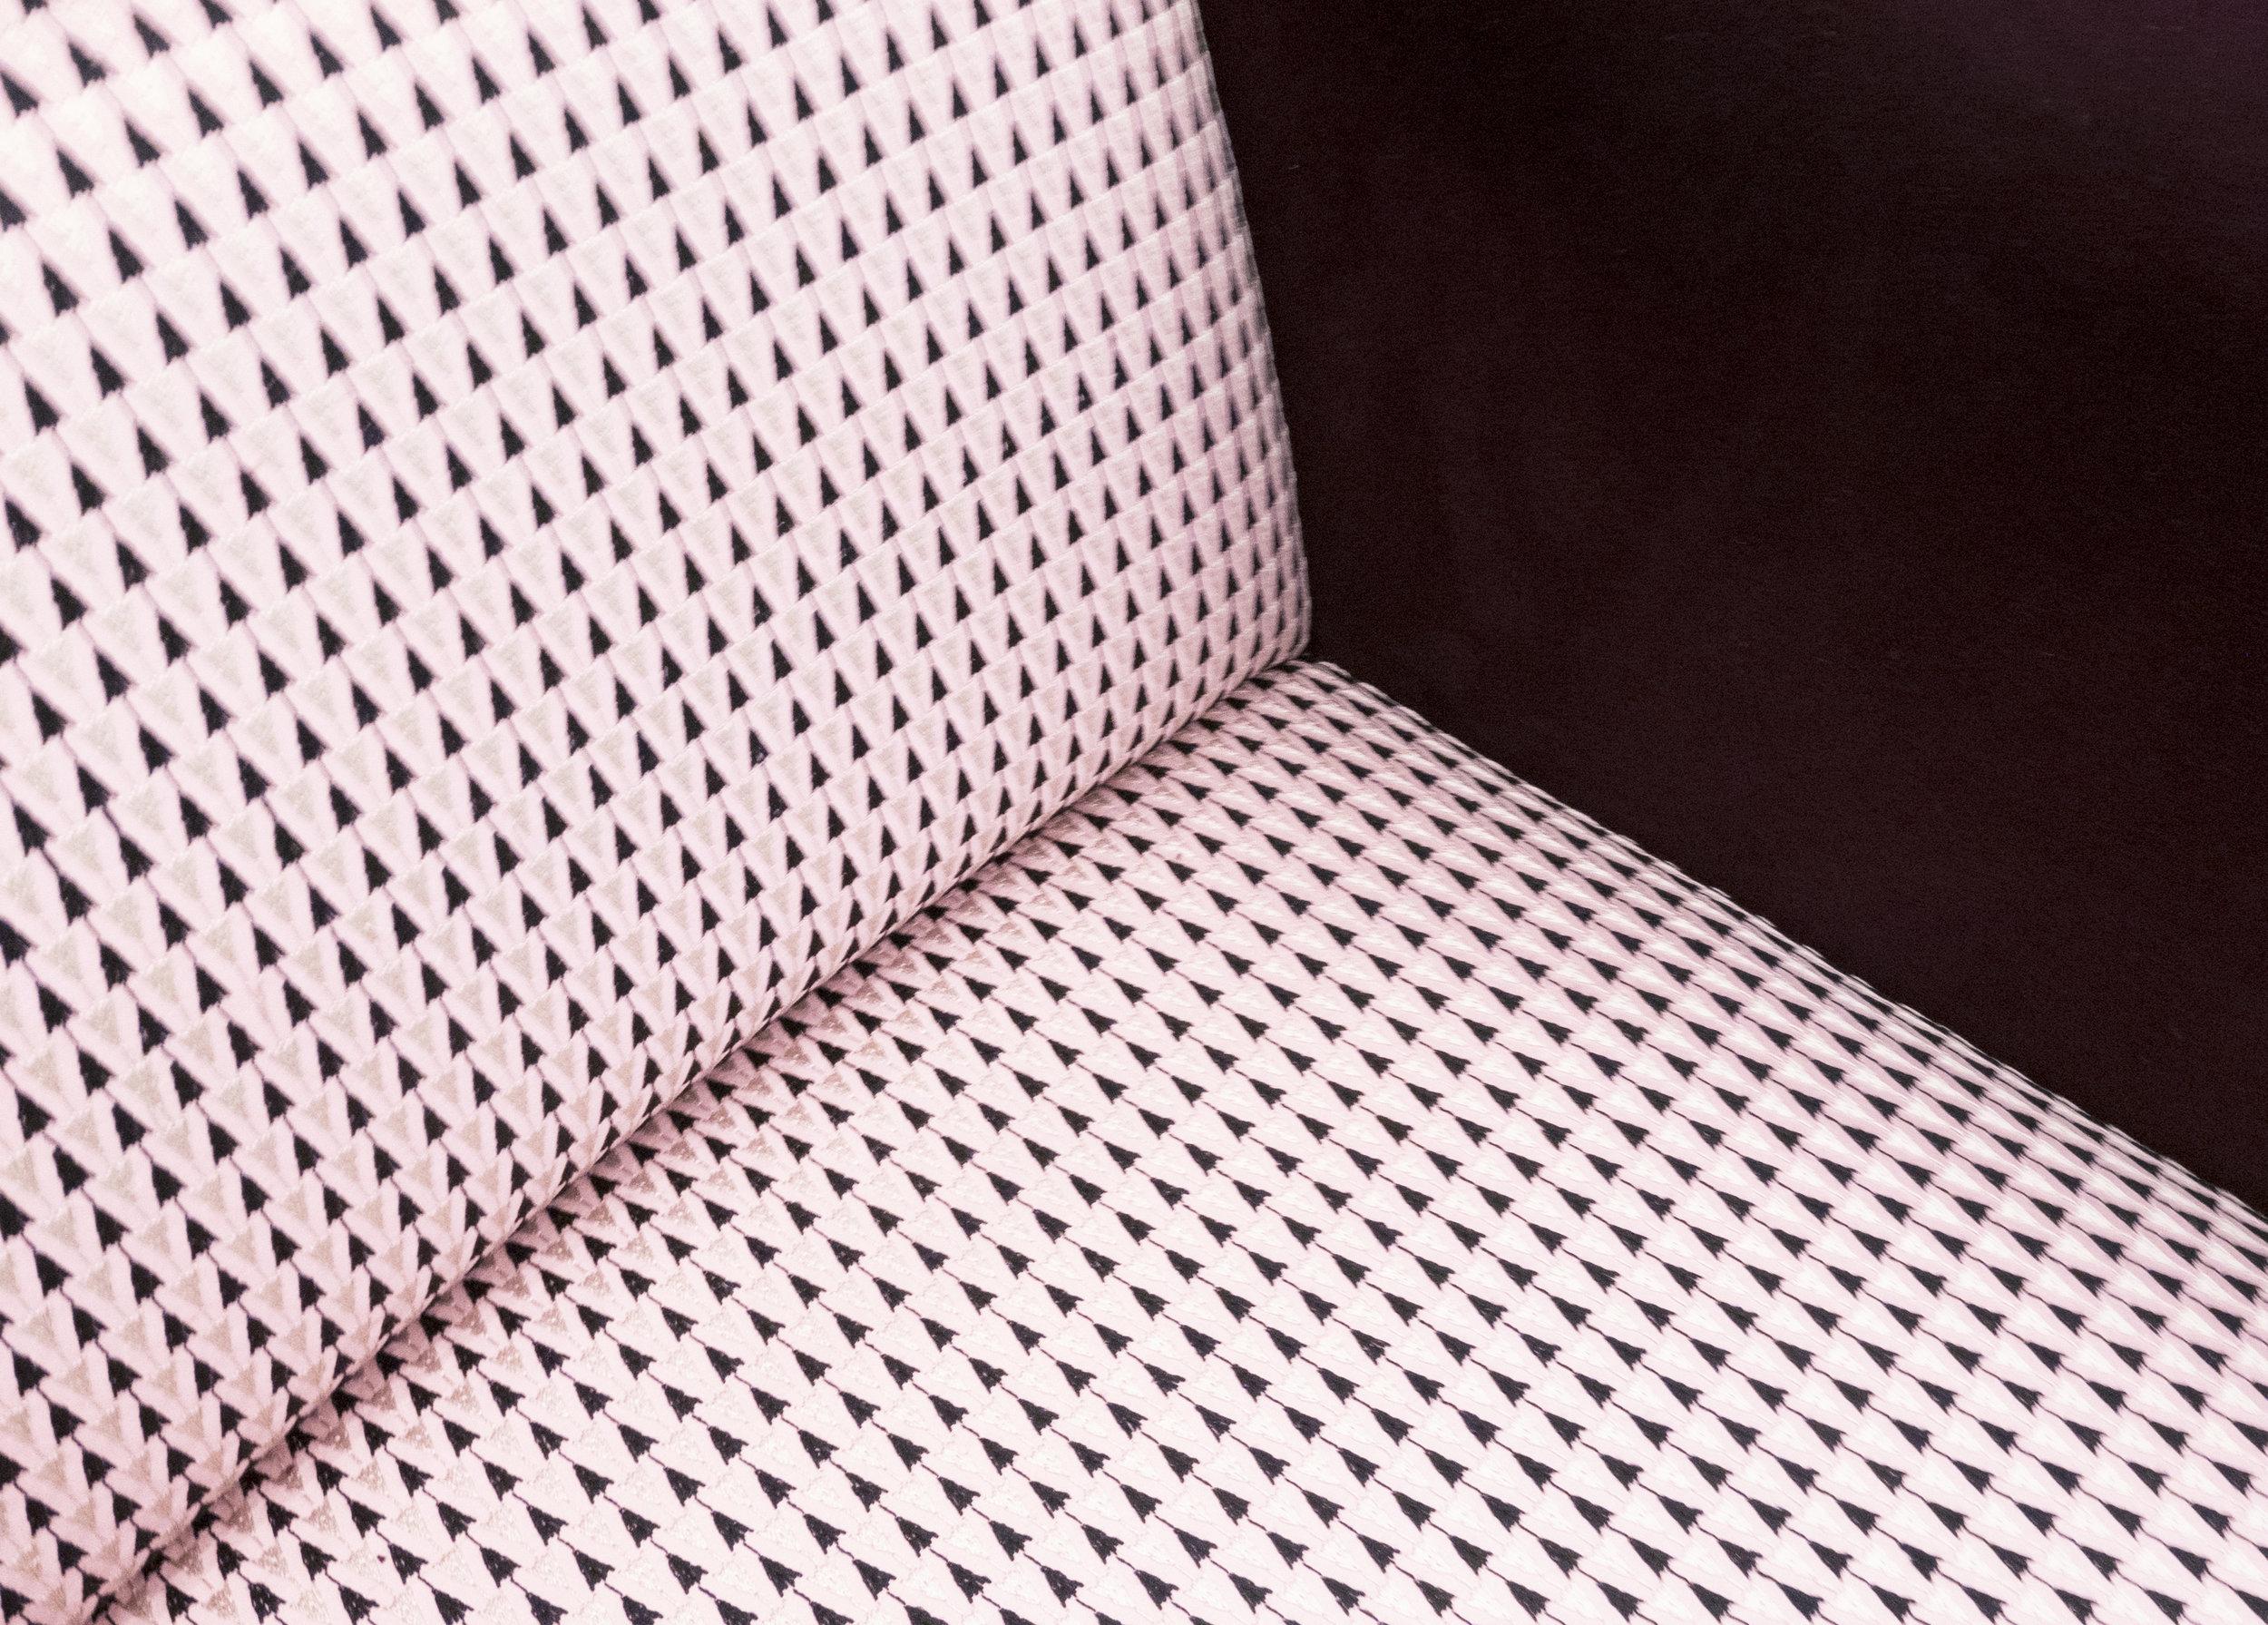 Gigi Radice, Chairs for Minotti, c. 1950 - 1959, Brass, Dedar Milano Upholstery, 31 H x 28 W x 29 D inches_7.jpg